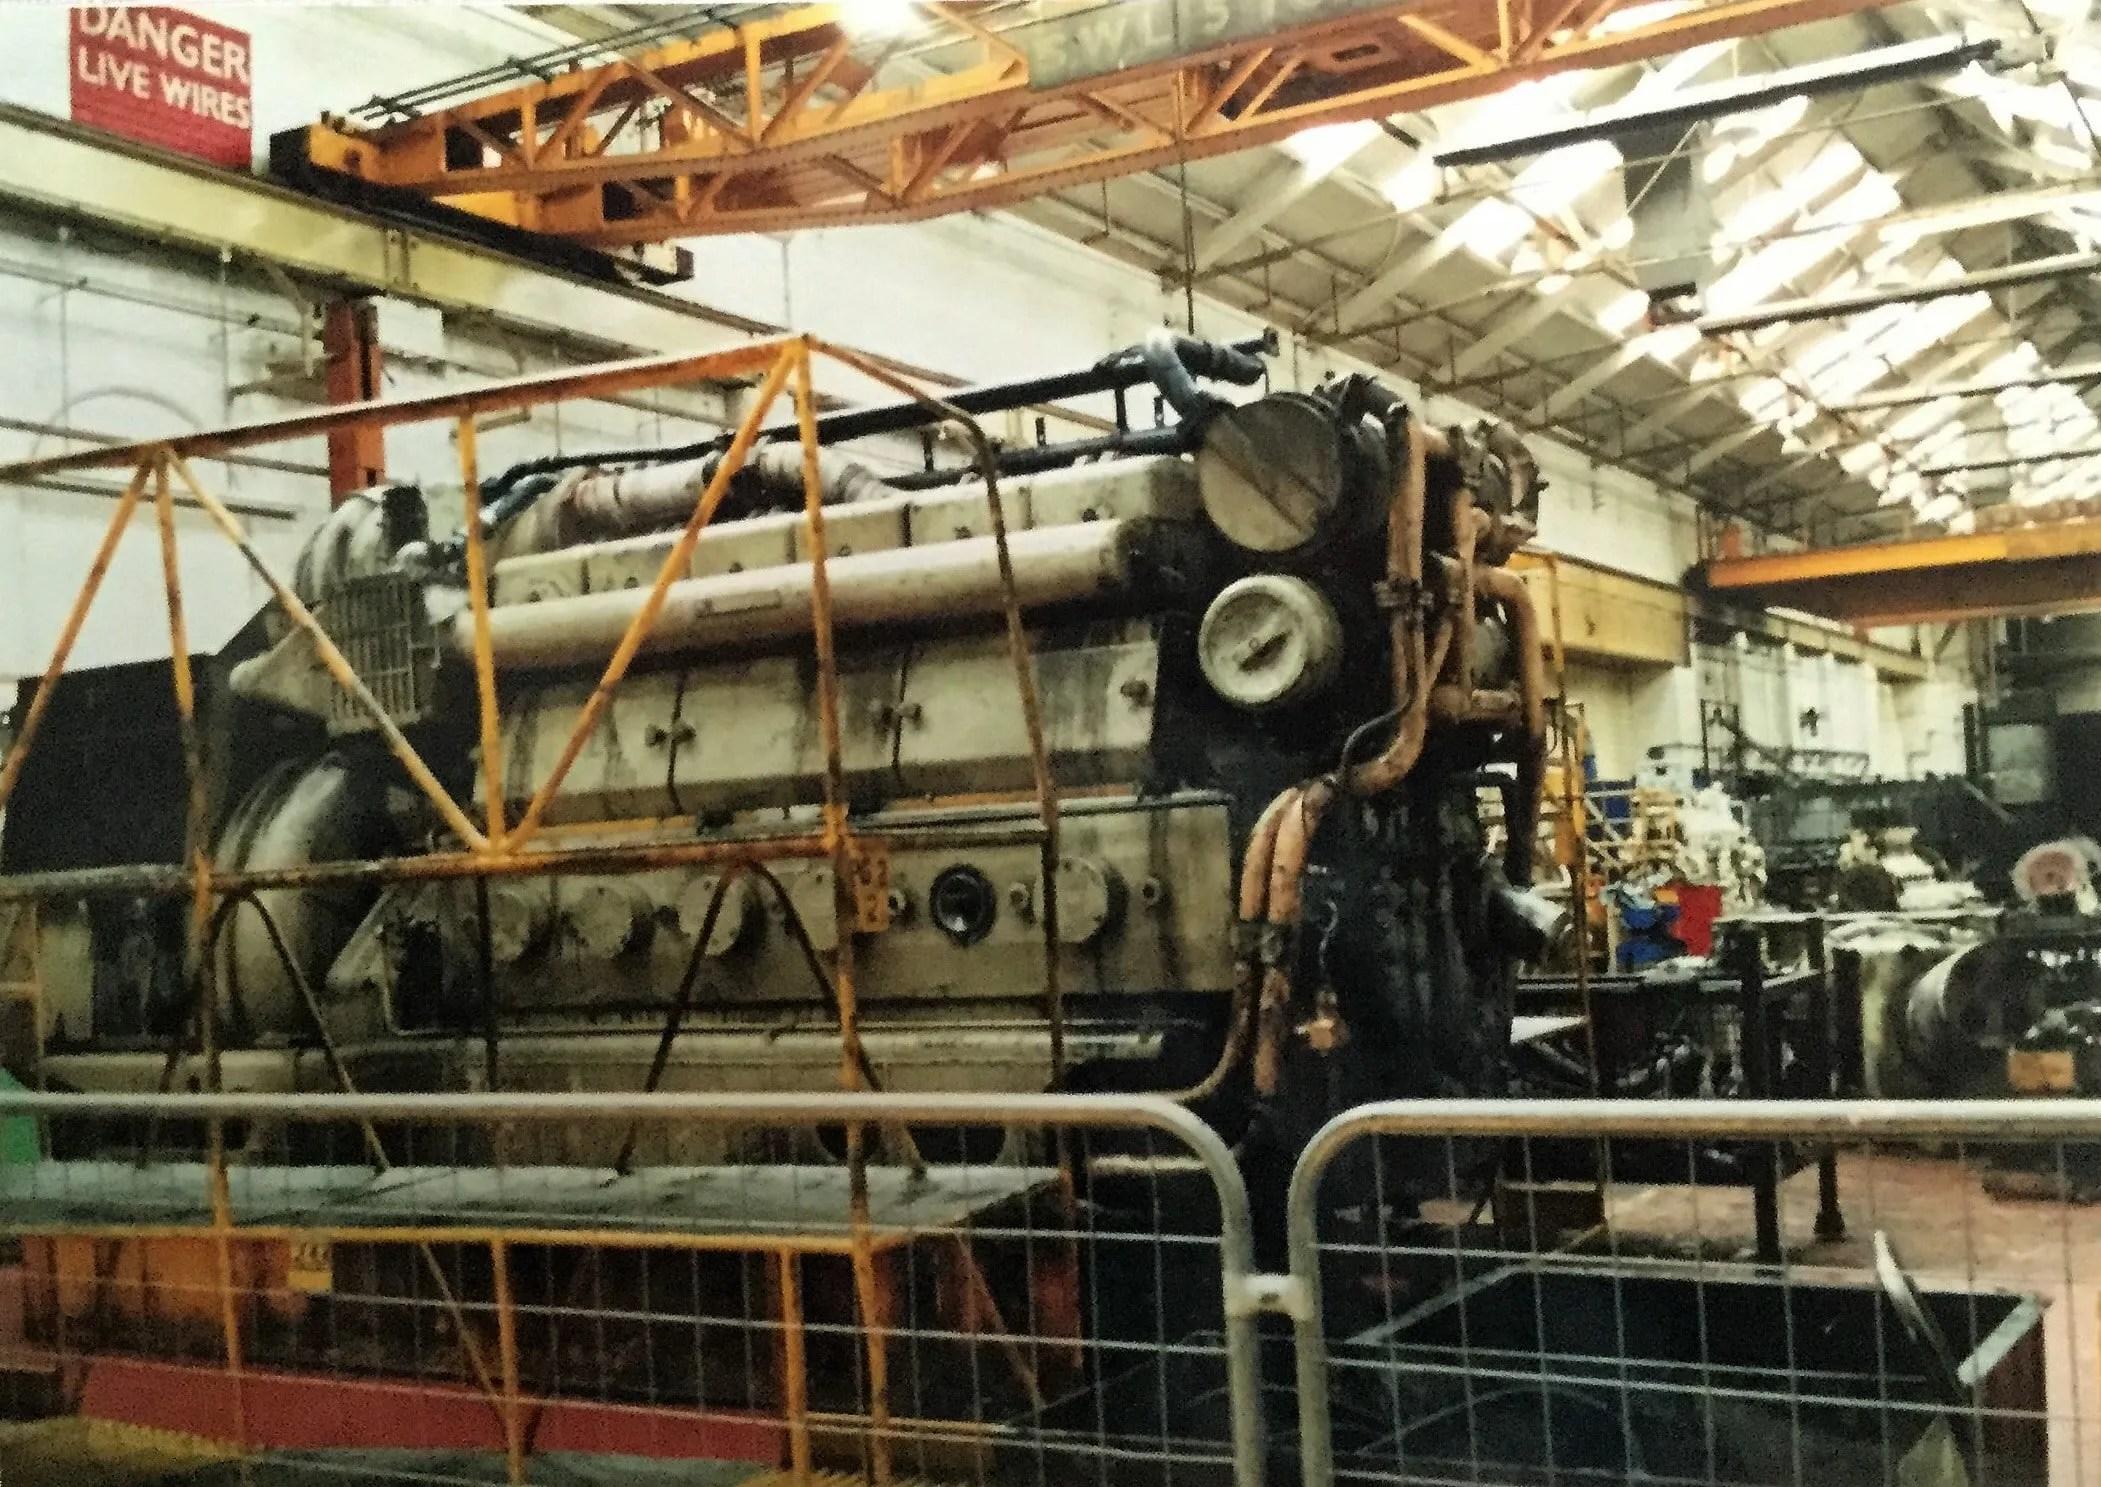 Class 47 Sulzer locomotive engine at Crewe Works